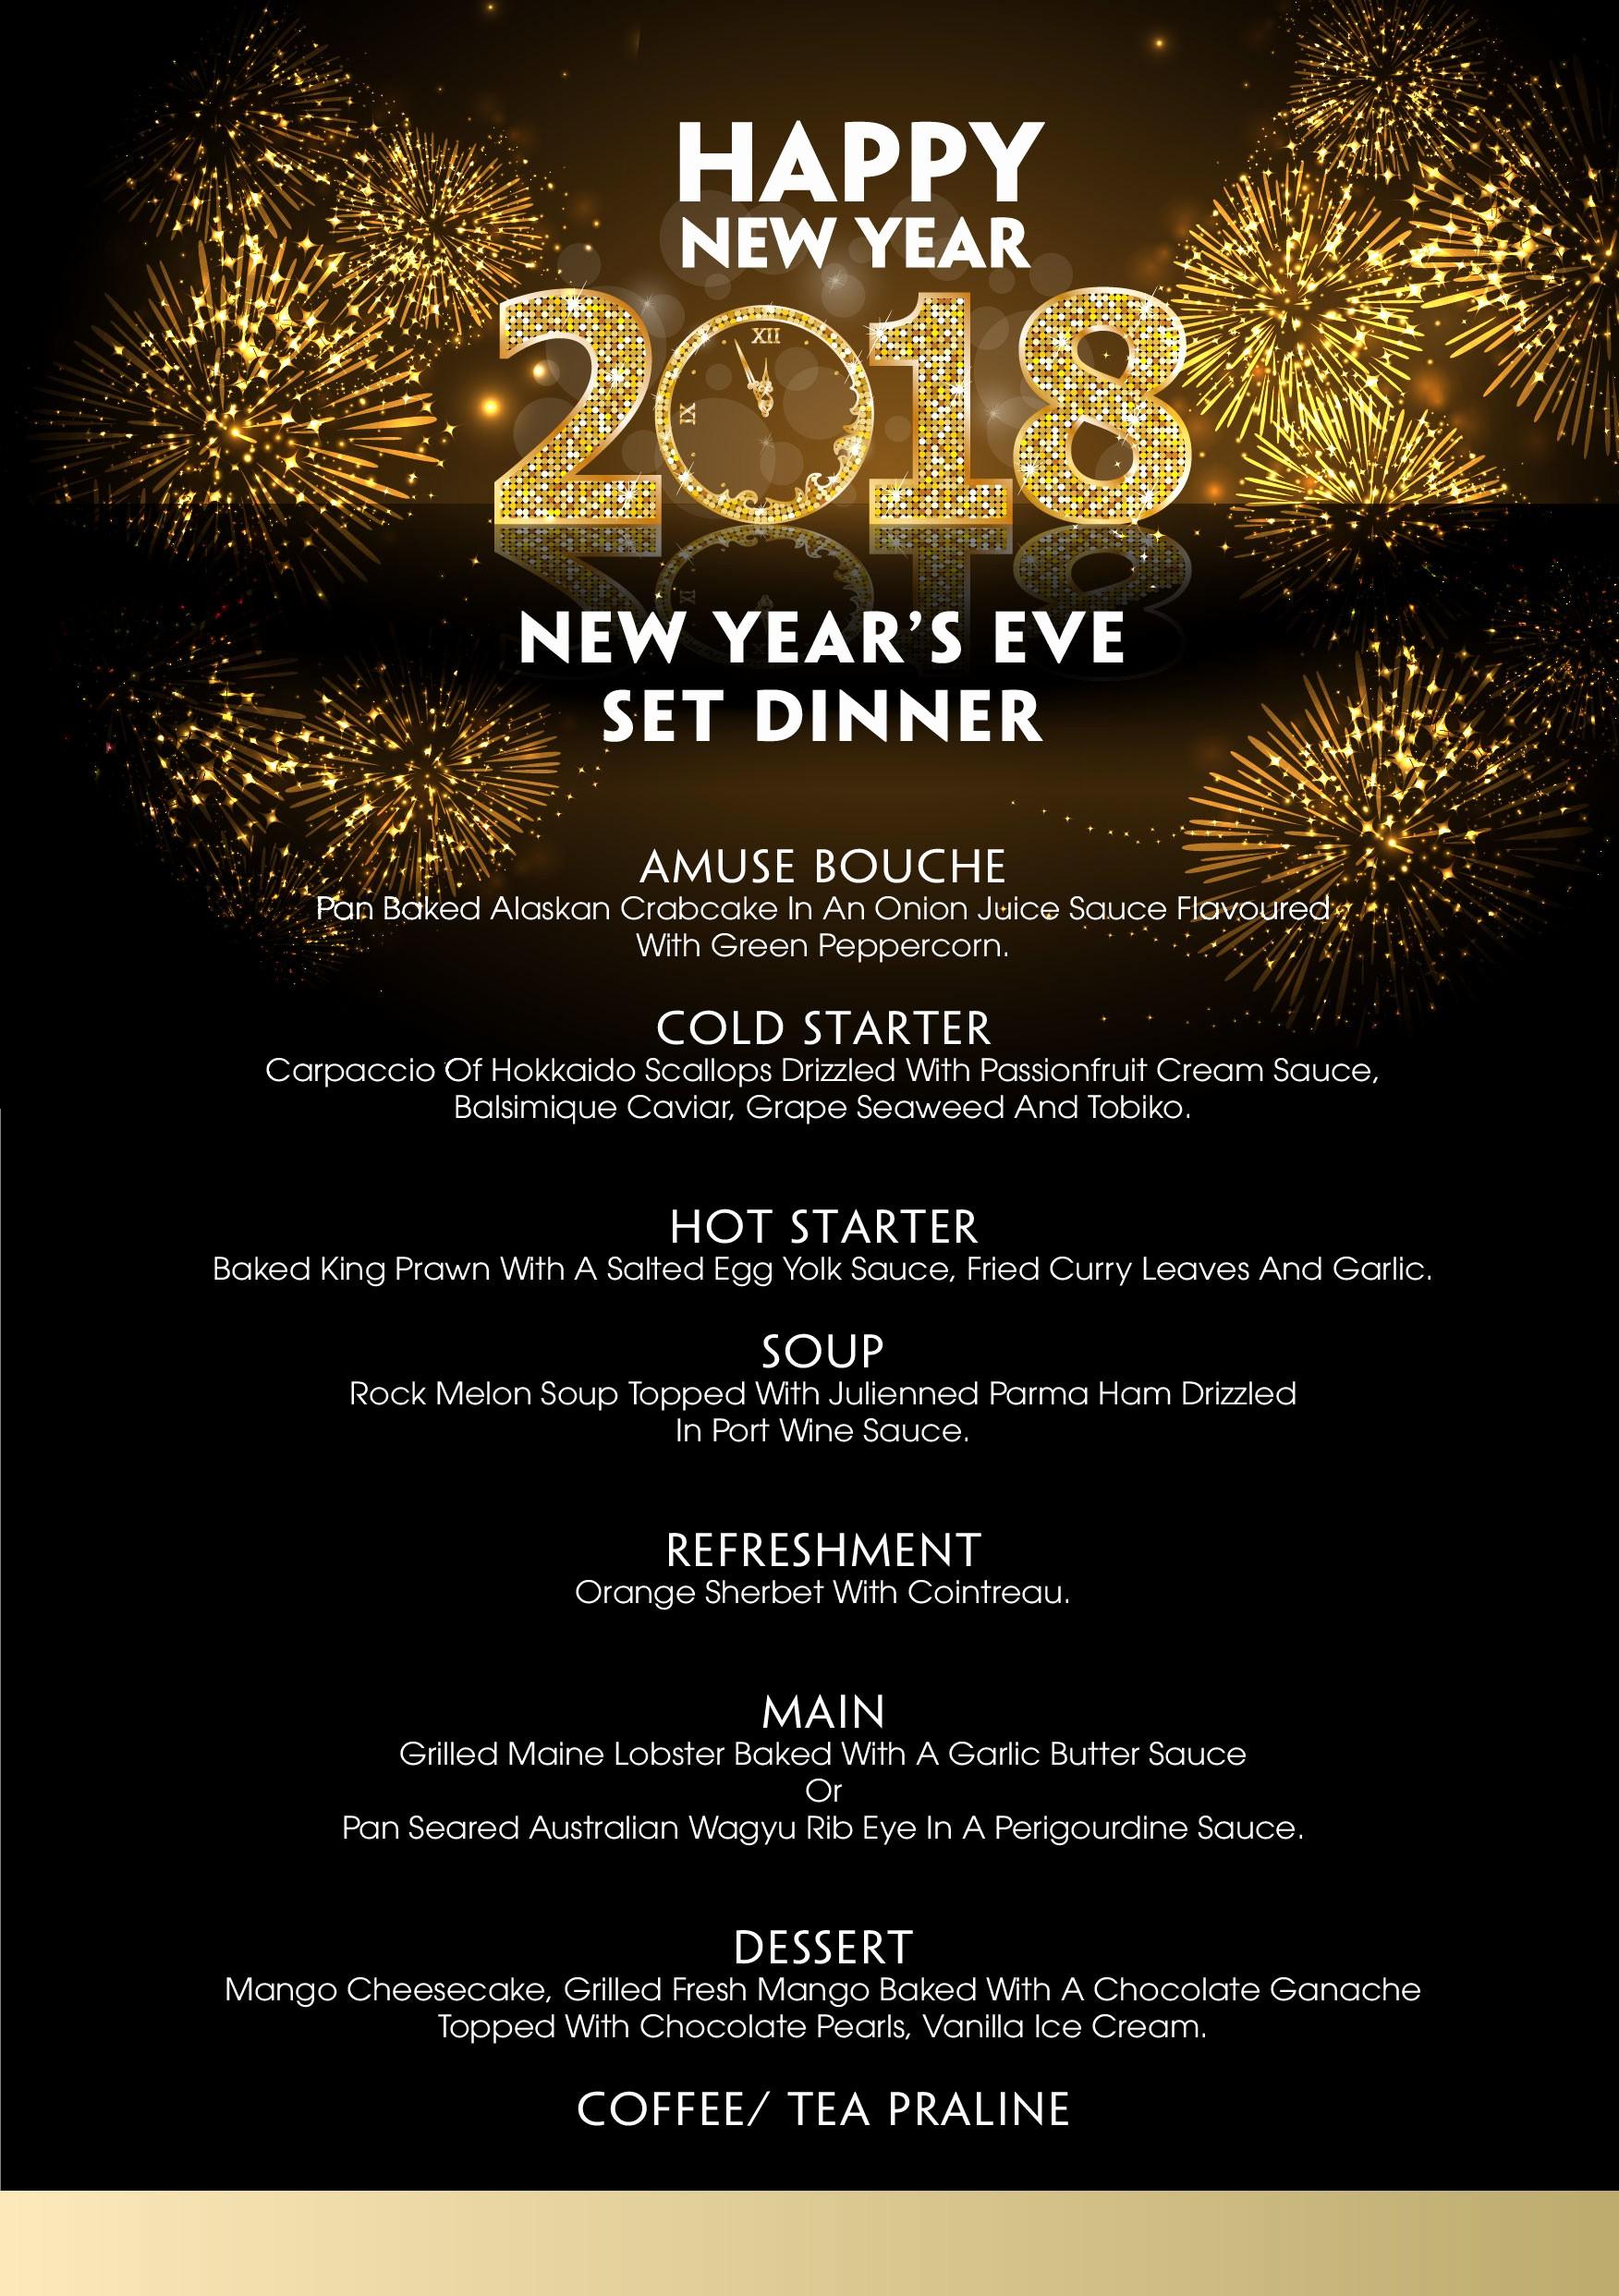 New Years Eve Menu Template Elegant New Year Newar Menu Idea forars Eve Luncheonnew Quick